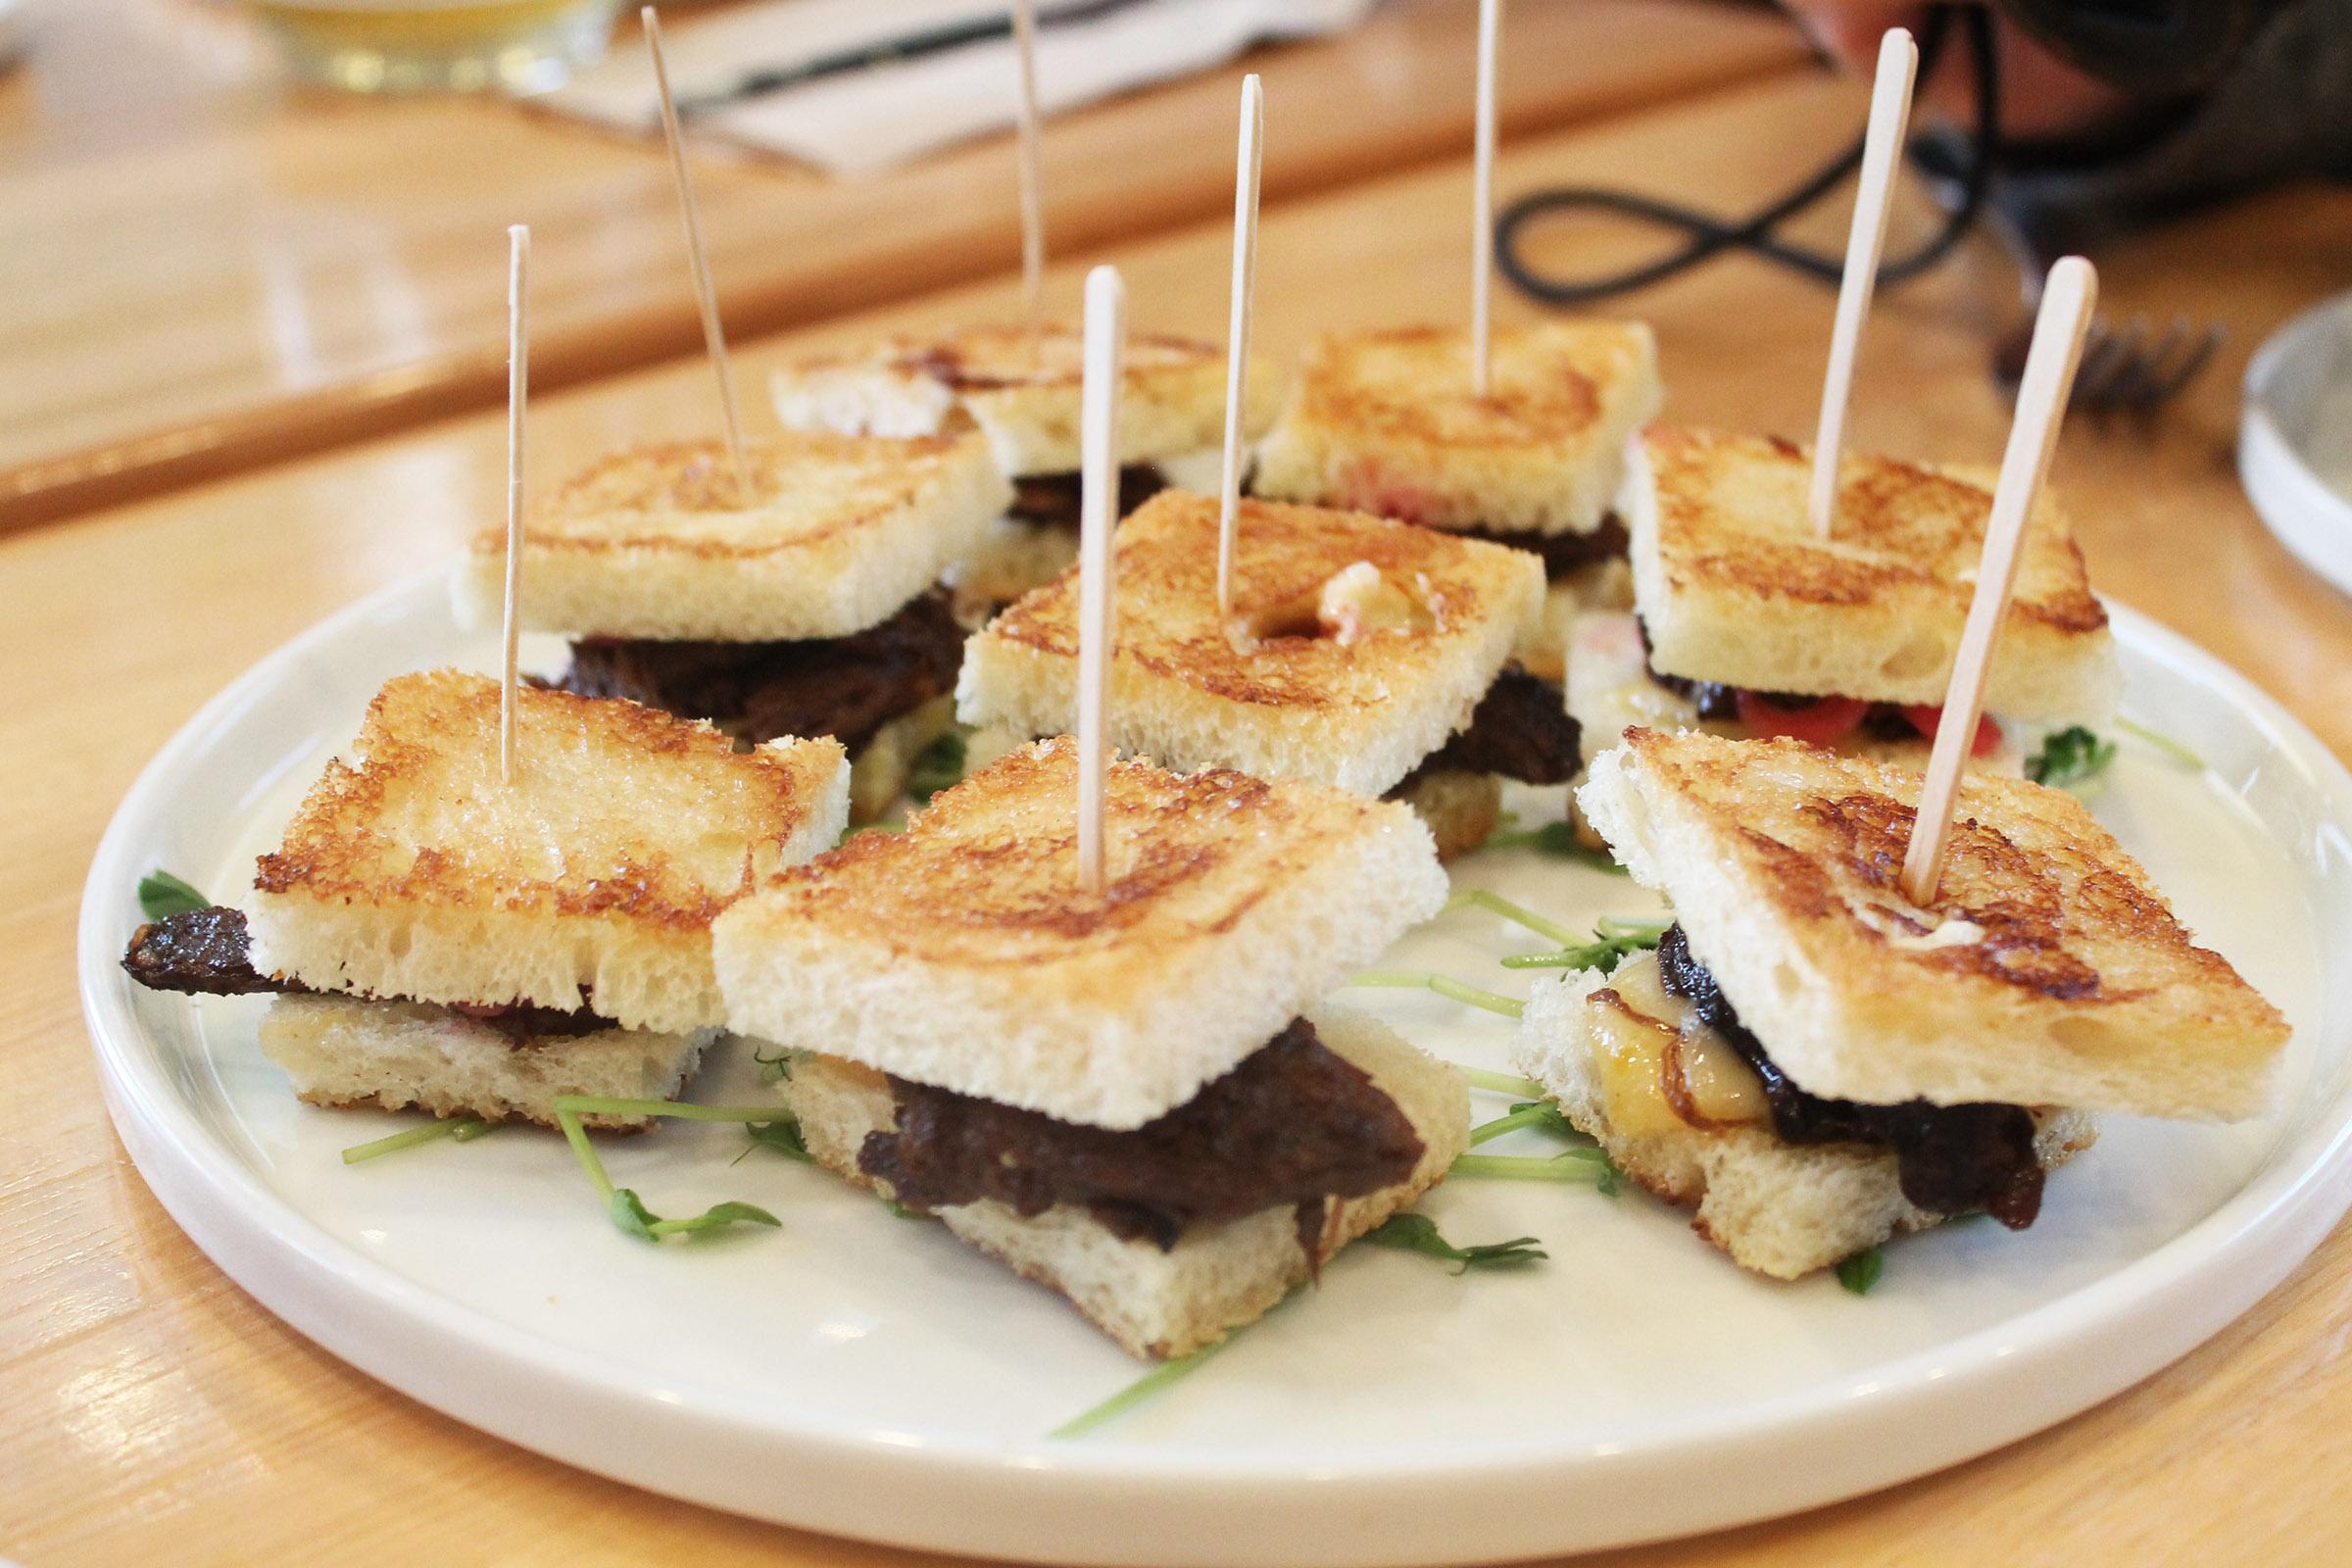 Briana's Short Rib Grilled Cheese :  Stout Braised Onions, Roasted Mushrooms, 'Merican Cheese, Black Vinegar Teriyaki, and russet wedges